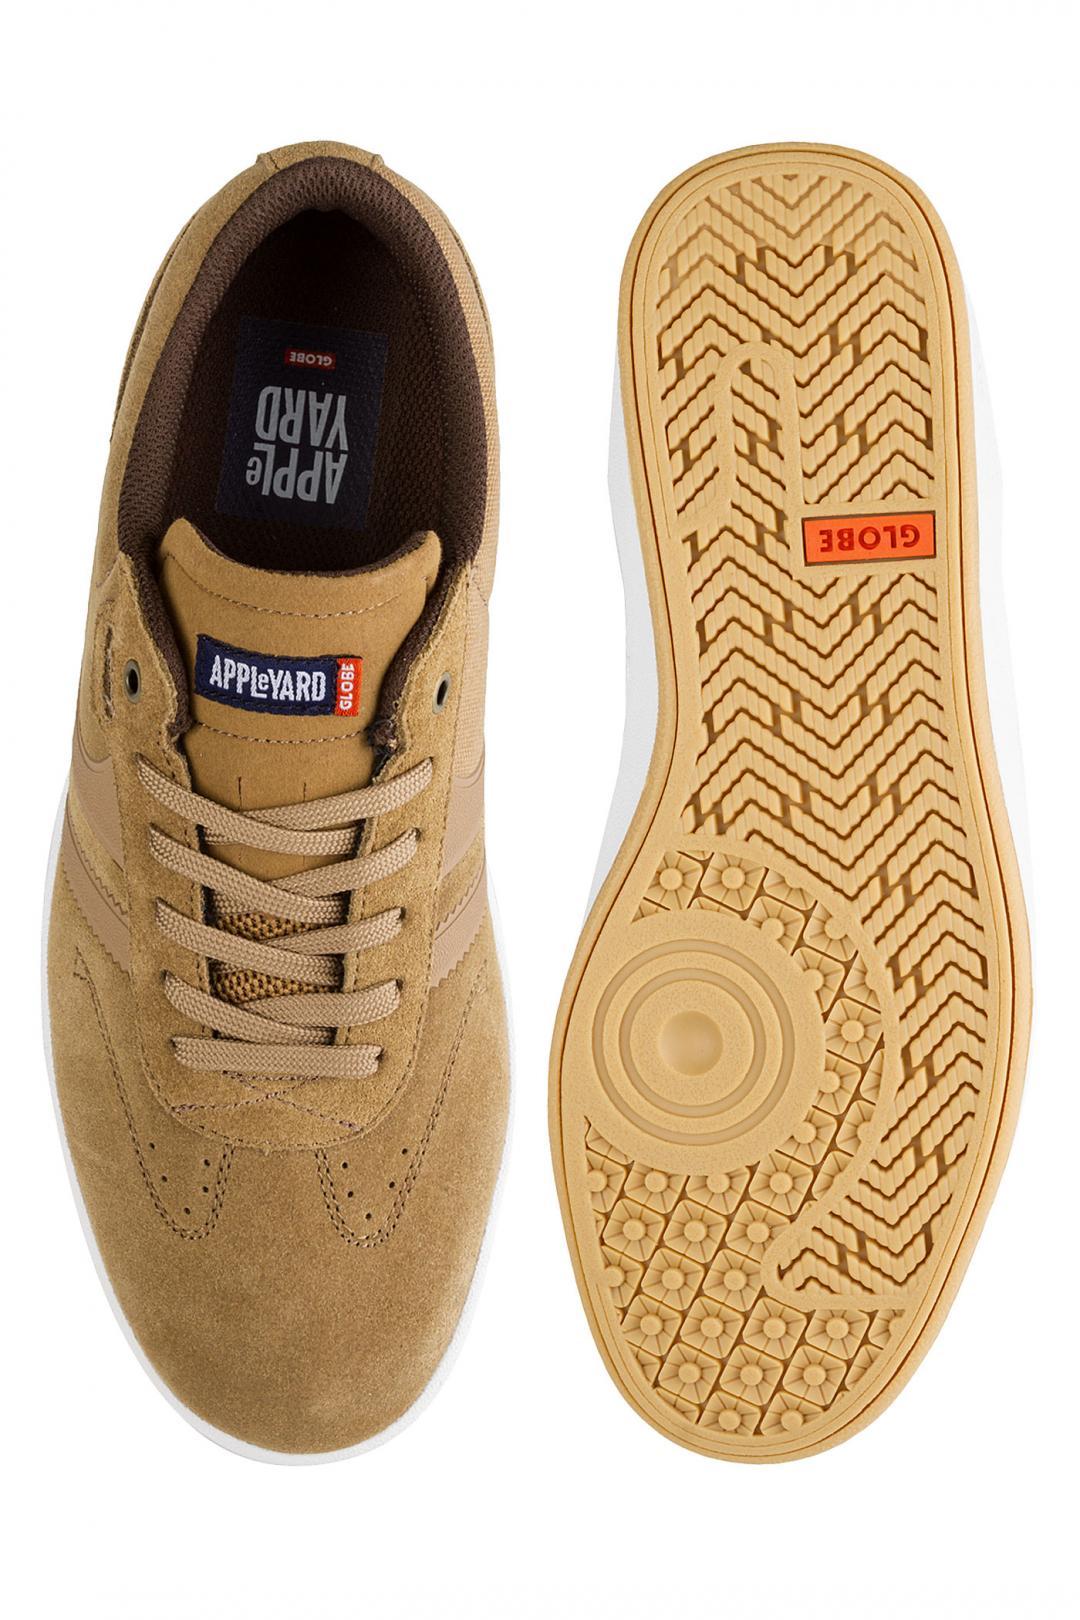 Uomo Globe Empire x Mark Appleyard tobacco gum | Sneaker